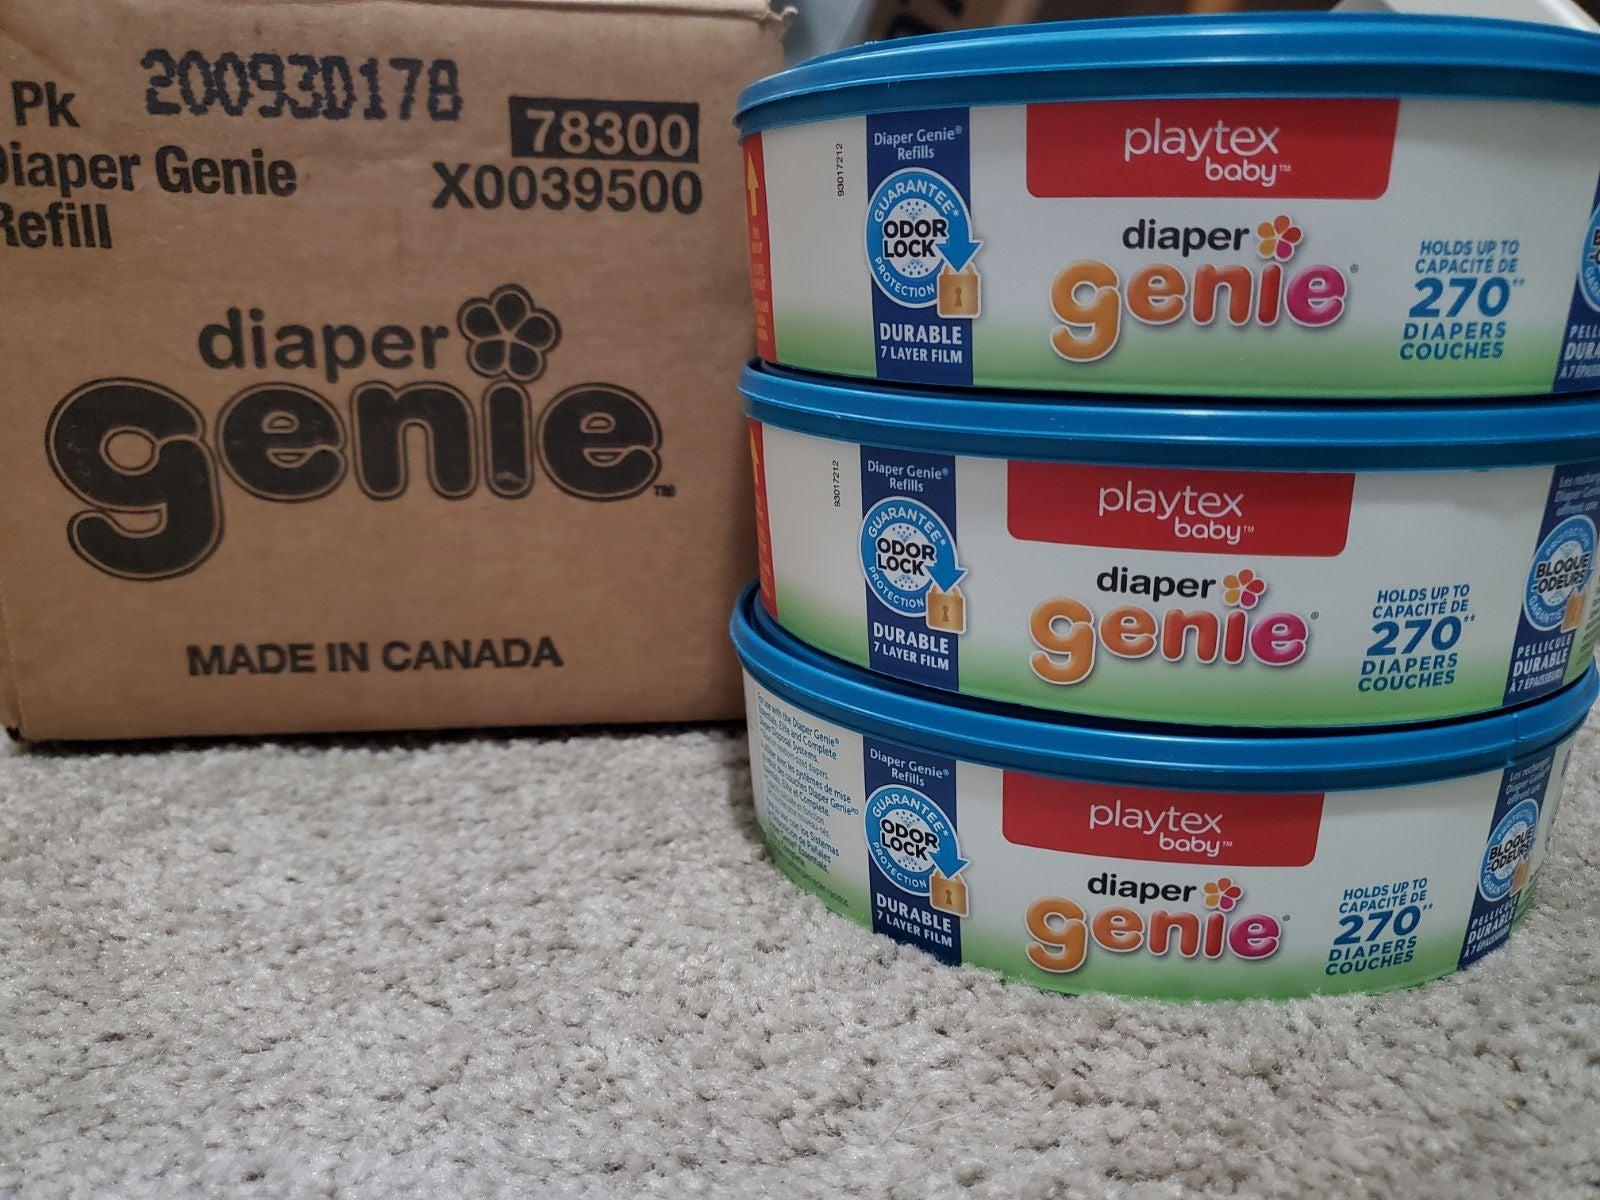 3 Diaper Genie Refills Playtex Baby